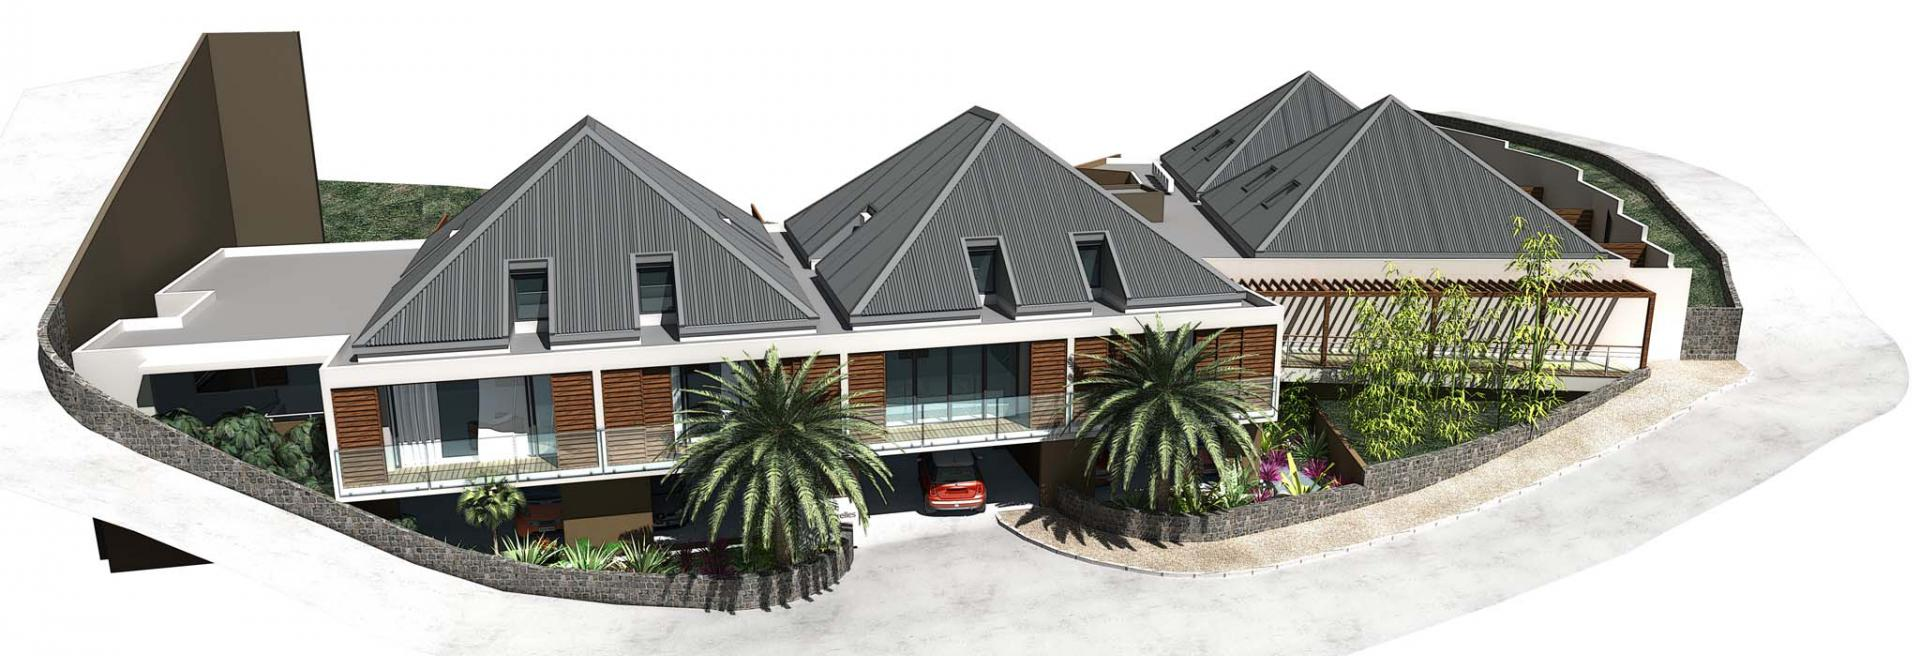 Residence le Rocher Vert St.Barth - Golden coast Real Estate